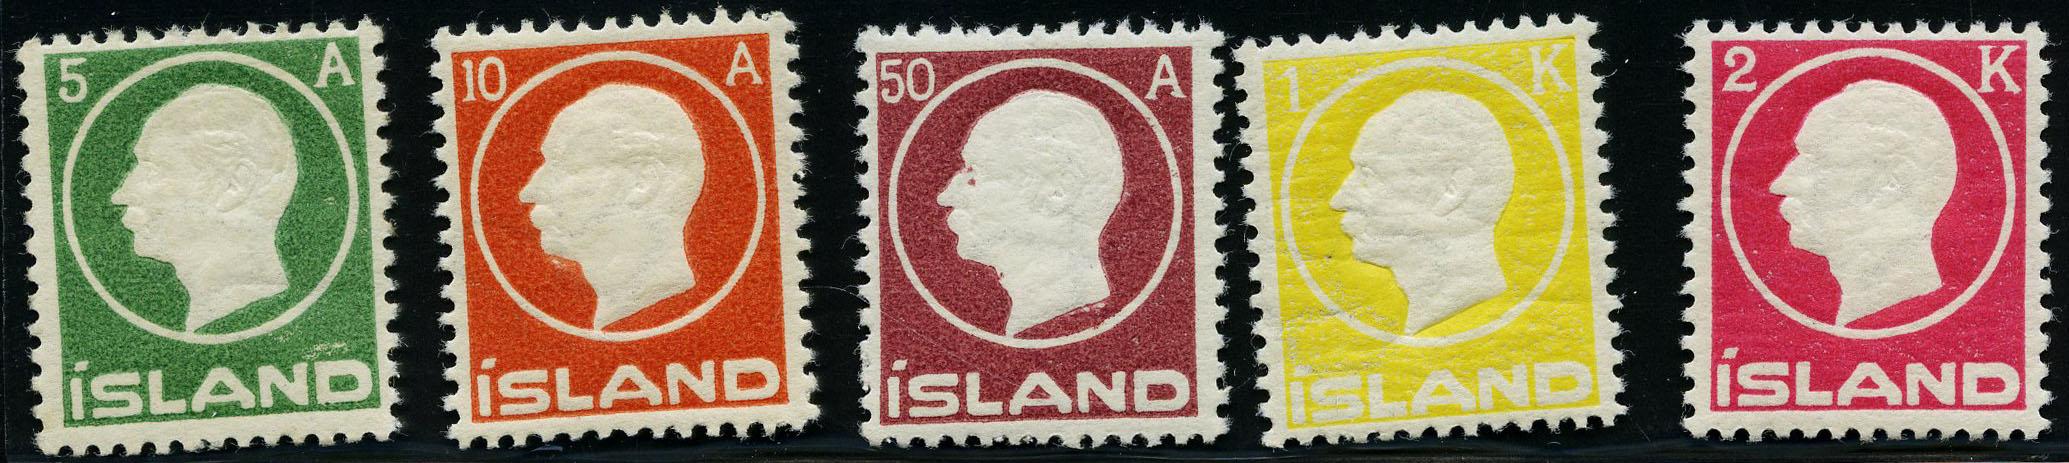 Lot 2081 - Island AFA 1-82 (AFA)  -  Skanfil Auksjoner AS  Public auction 211